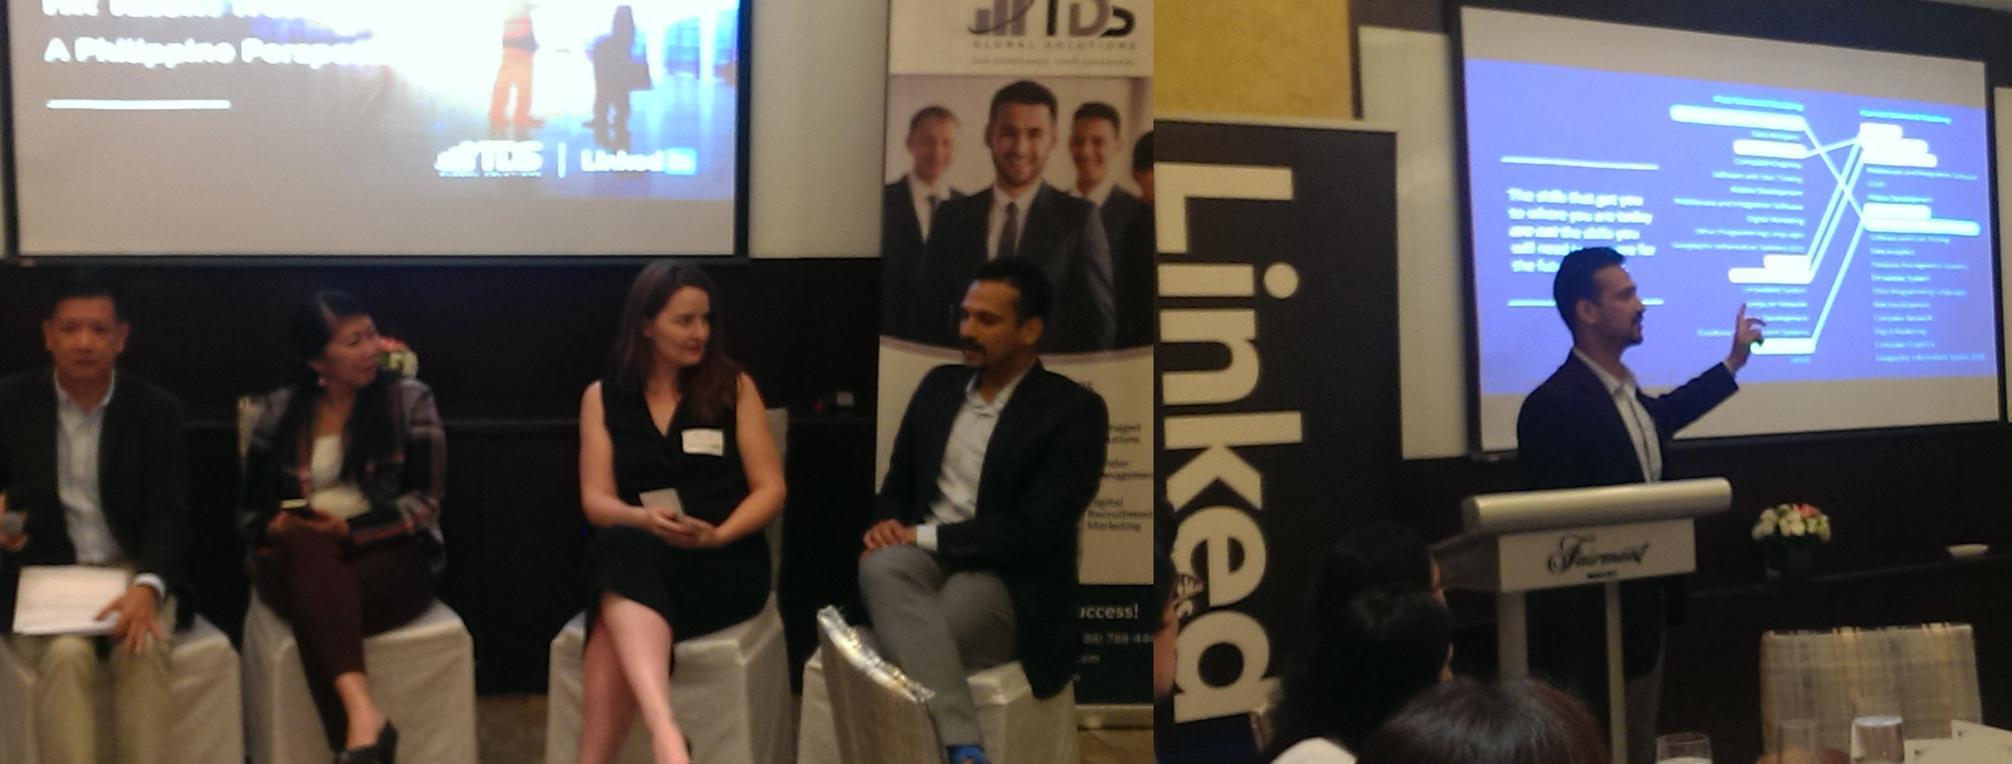 Talent-trends-2-LinkedIn-forum